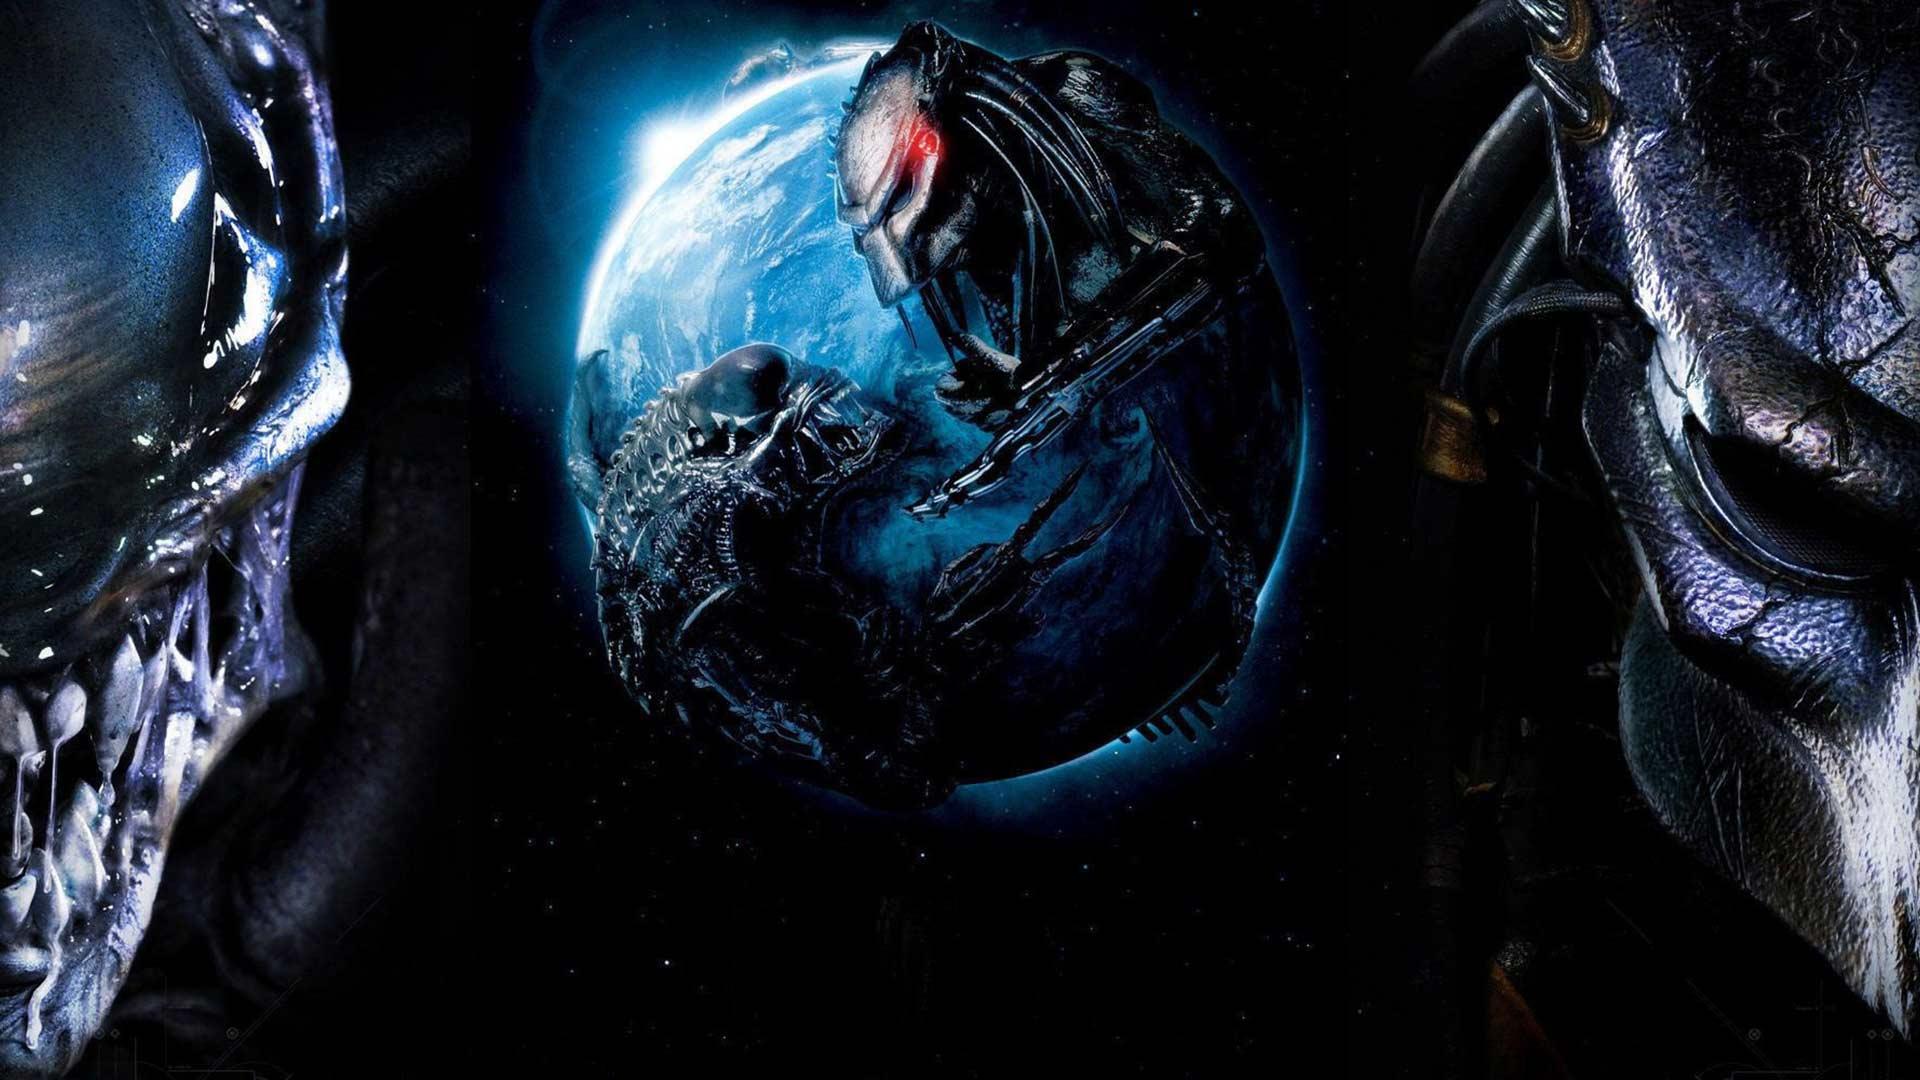 Alien Vs Predator  Full Movie Free